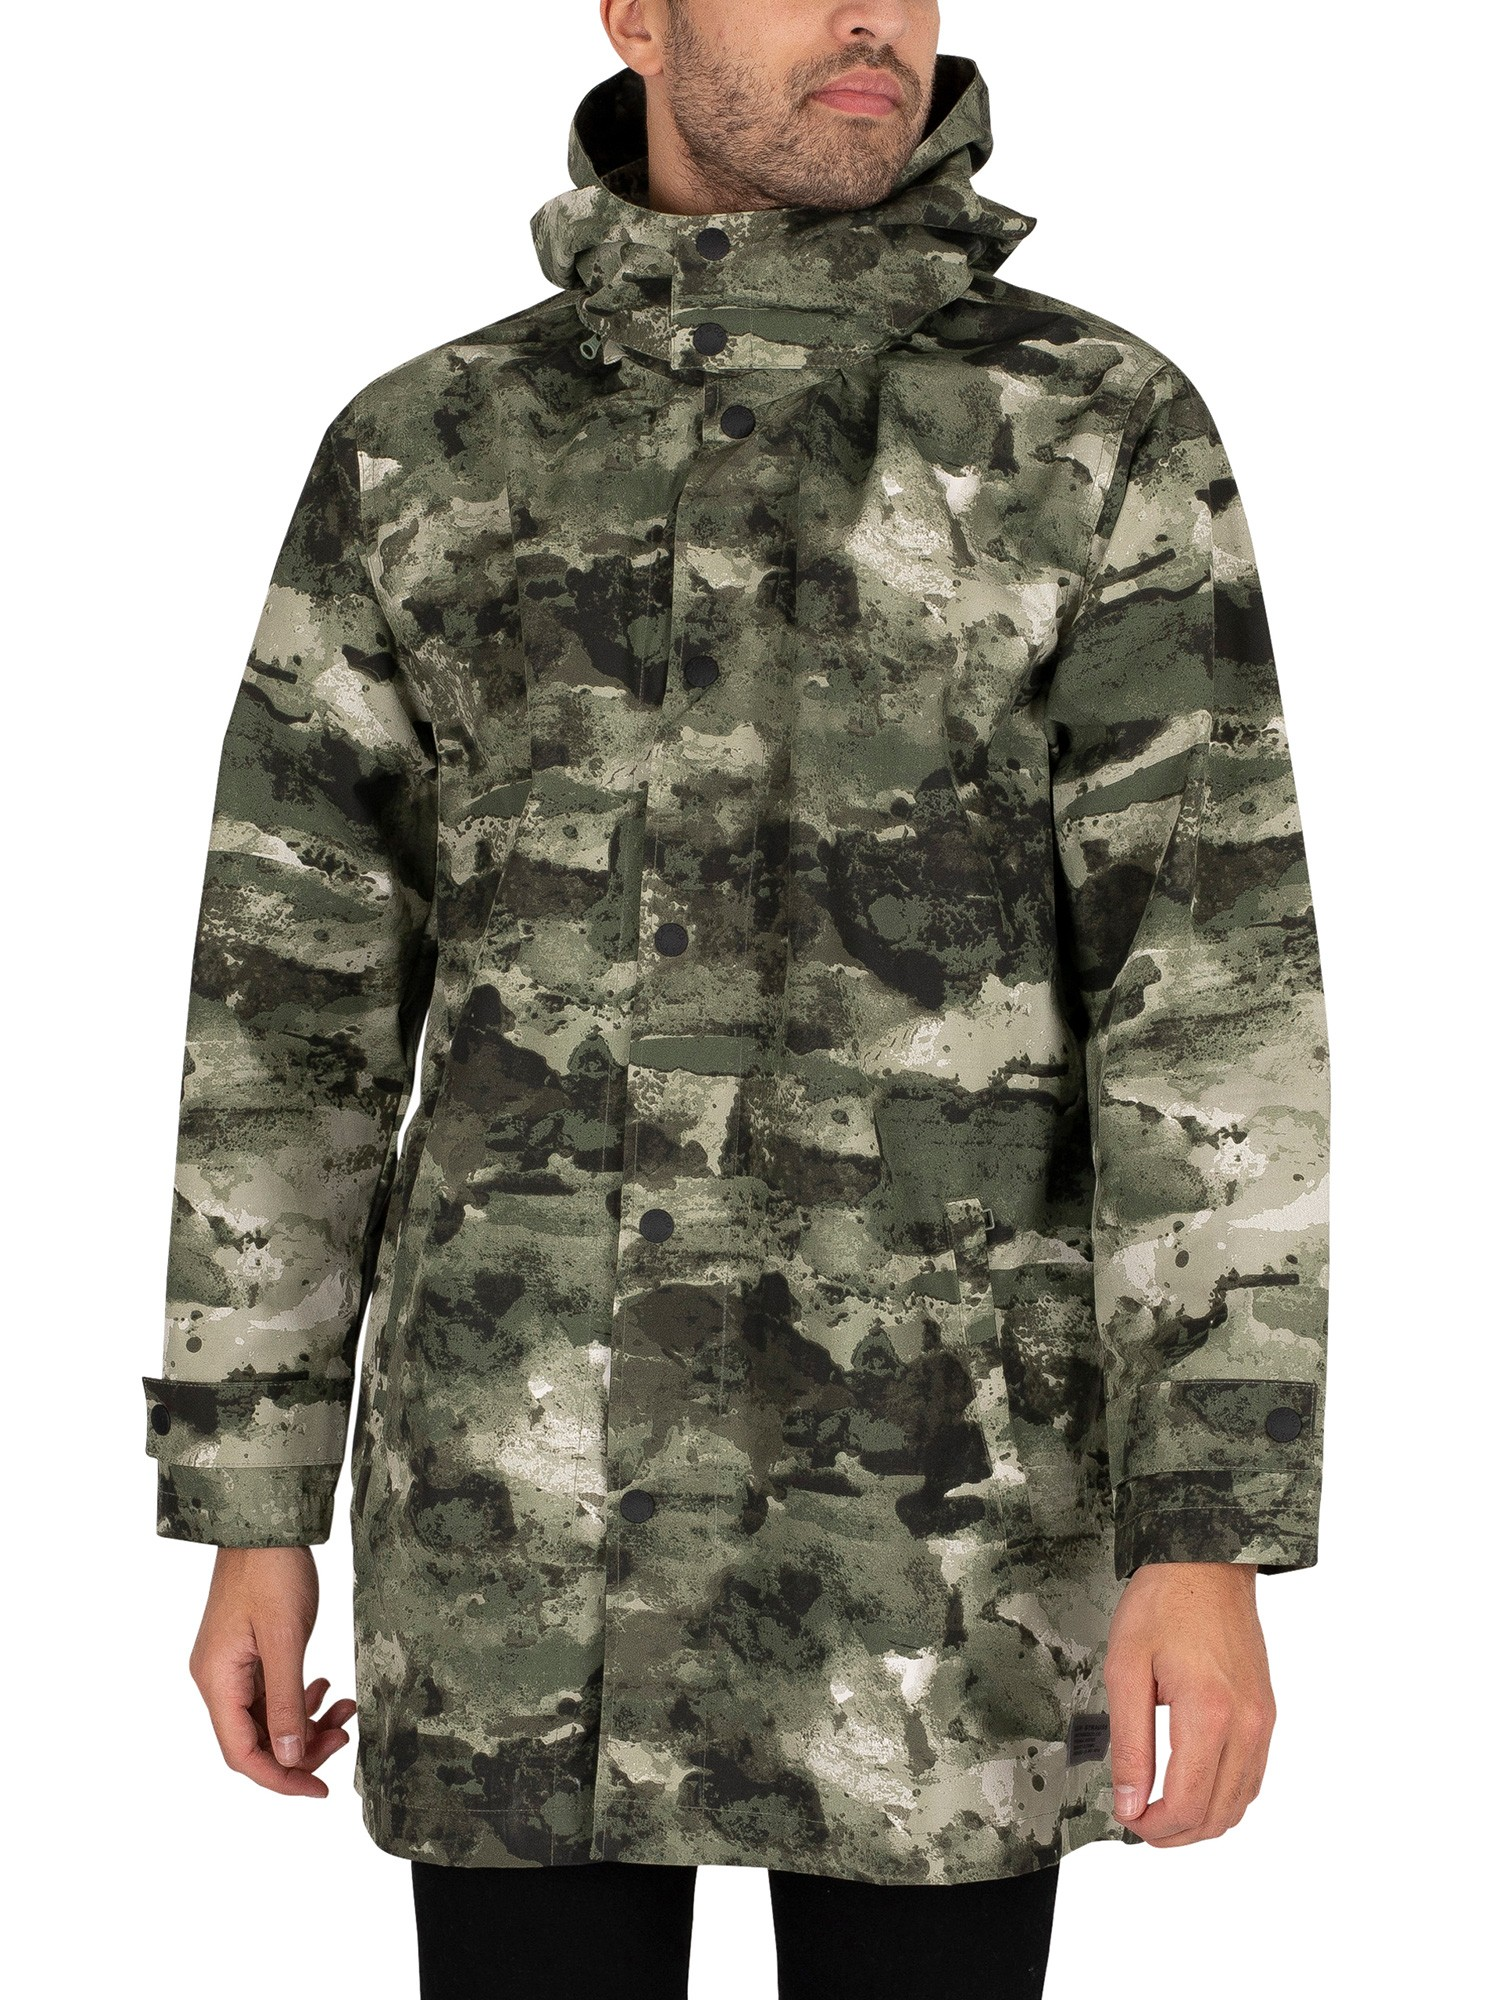 Mission Fishtail Parka Jacket